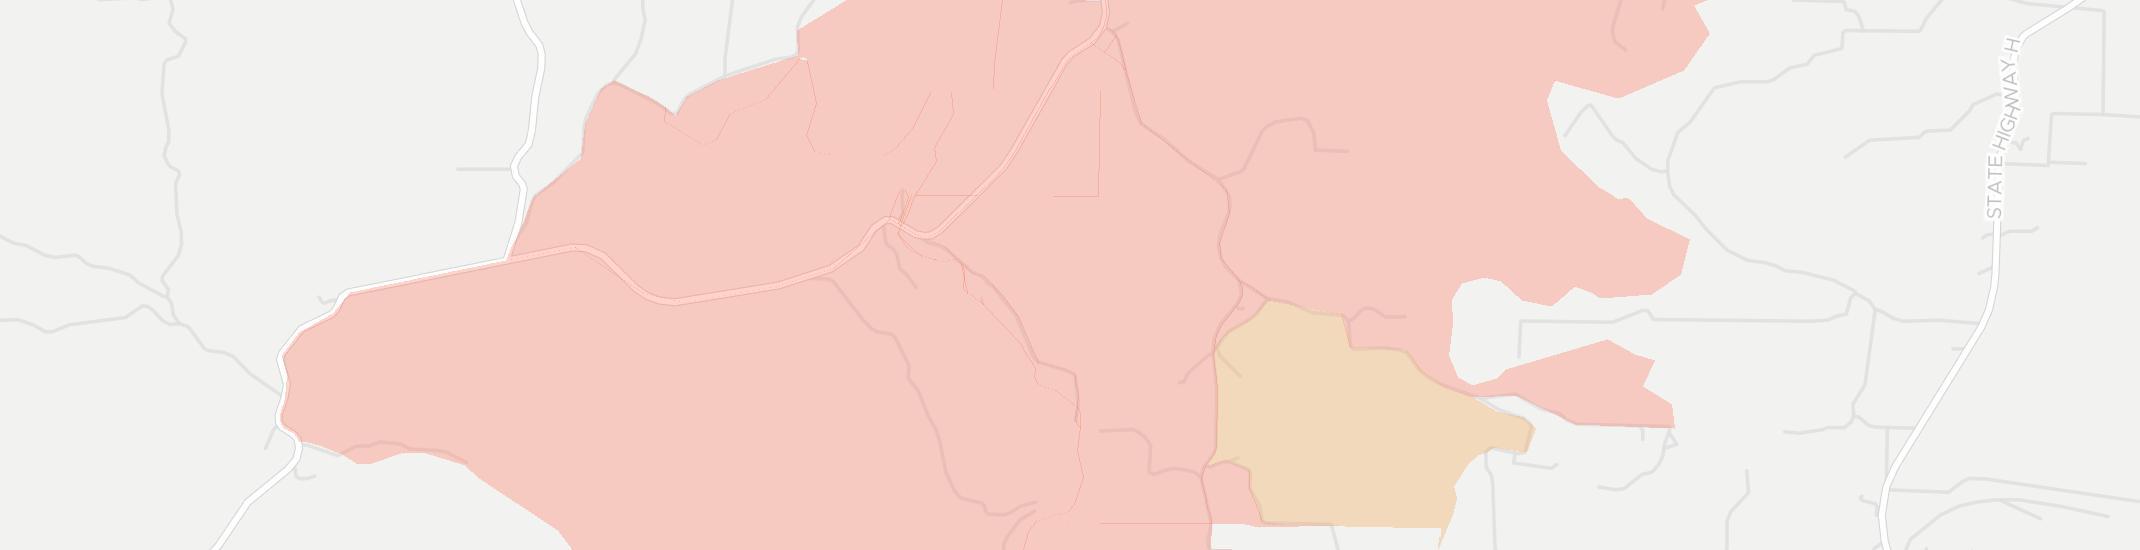 Zanoni Internet Competition Map. Click for interactive map.